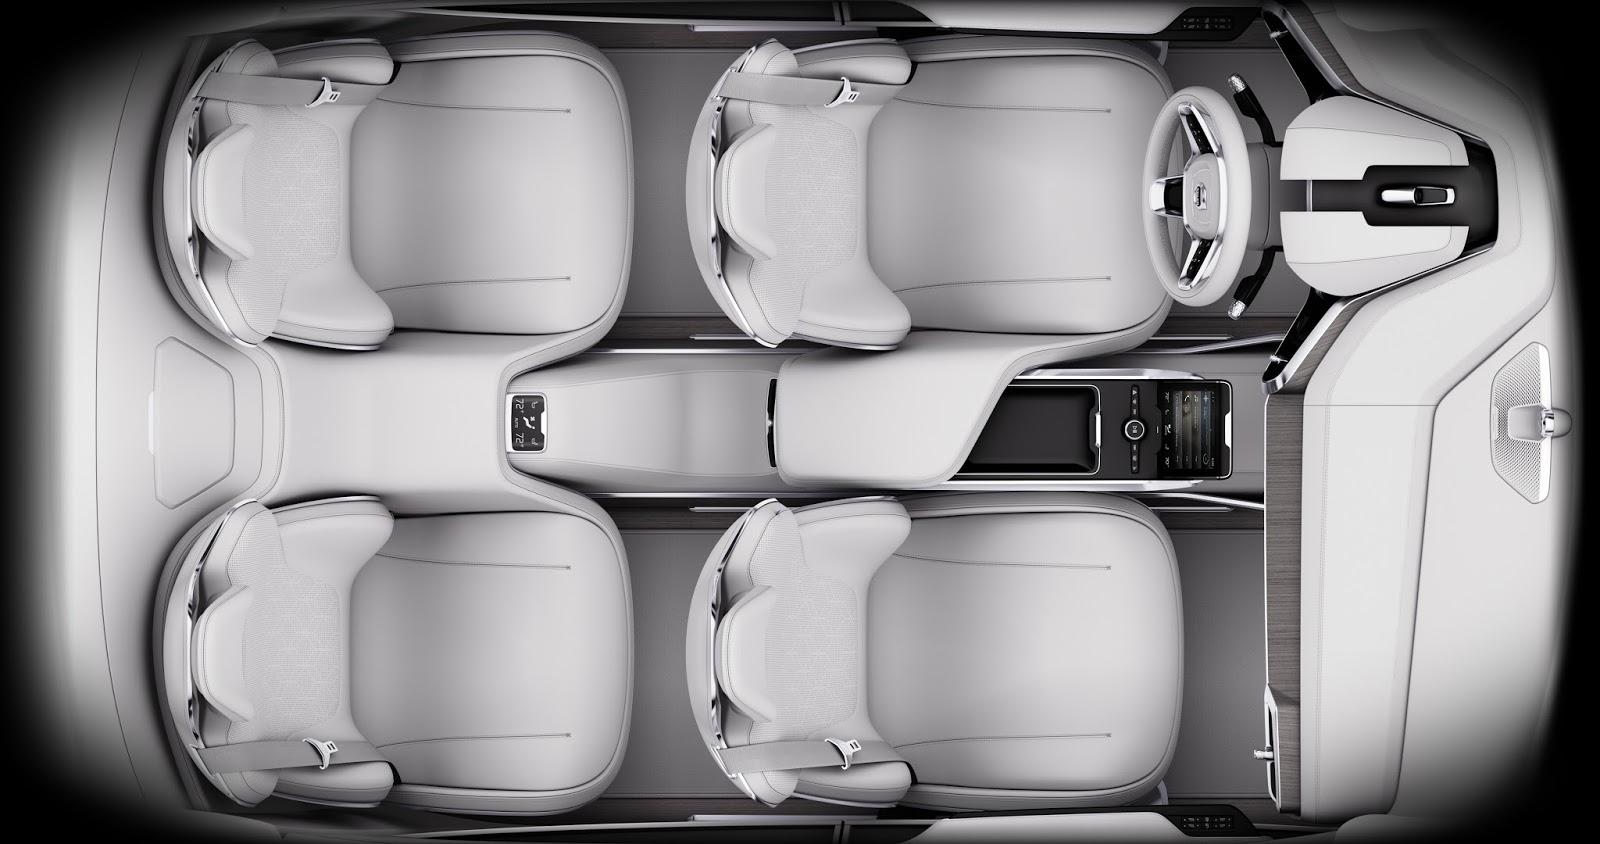 169541 Concept 26 Η Volvo θα κάνει και την αυτόνομη οδήγηση διασκεδαστική Autonomous Driving, Volvo, Volvo XC90, Αυτόνομη οδήγηση